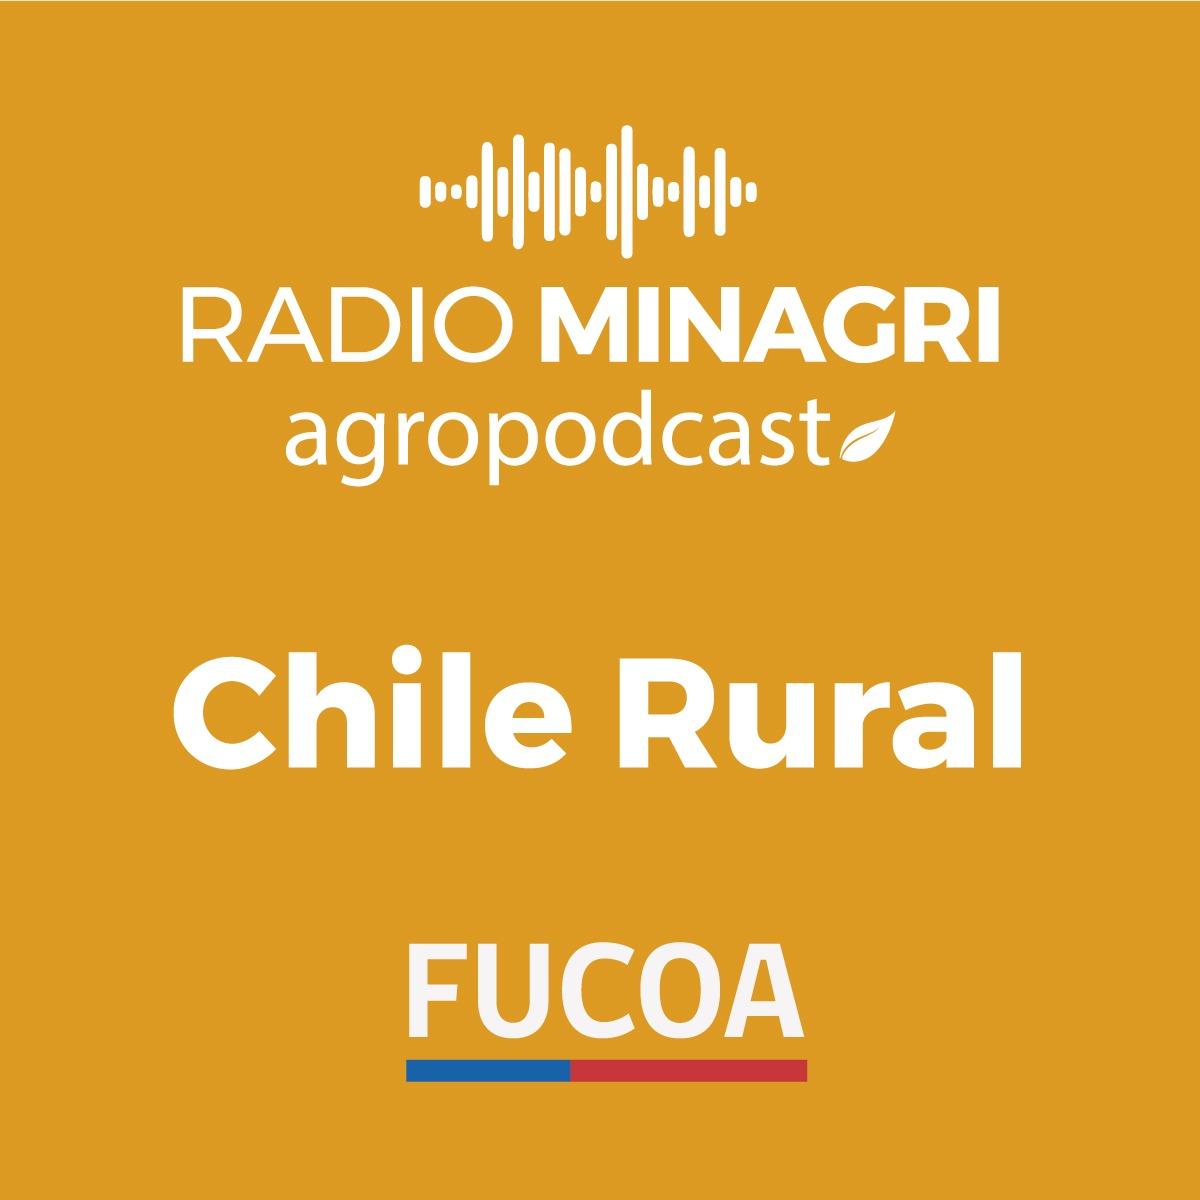 Chile Rural – Episodio 68: Inauguración compuertas bocatoma Armerillo en Maule